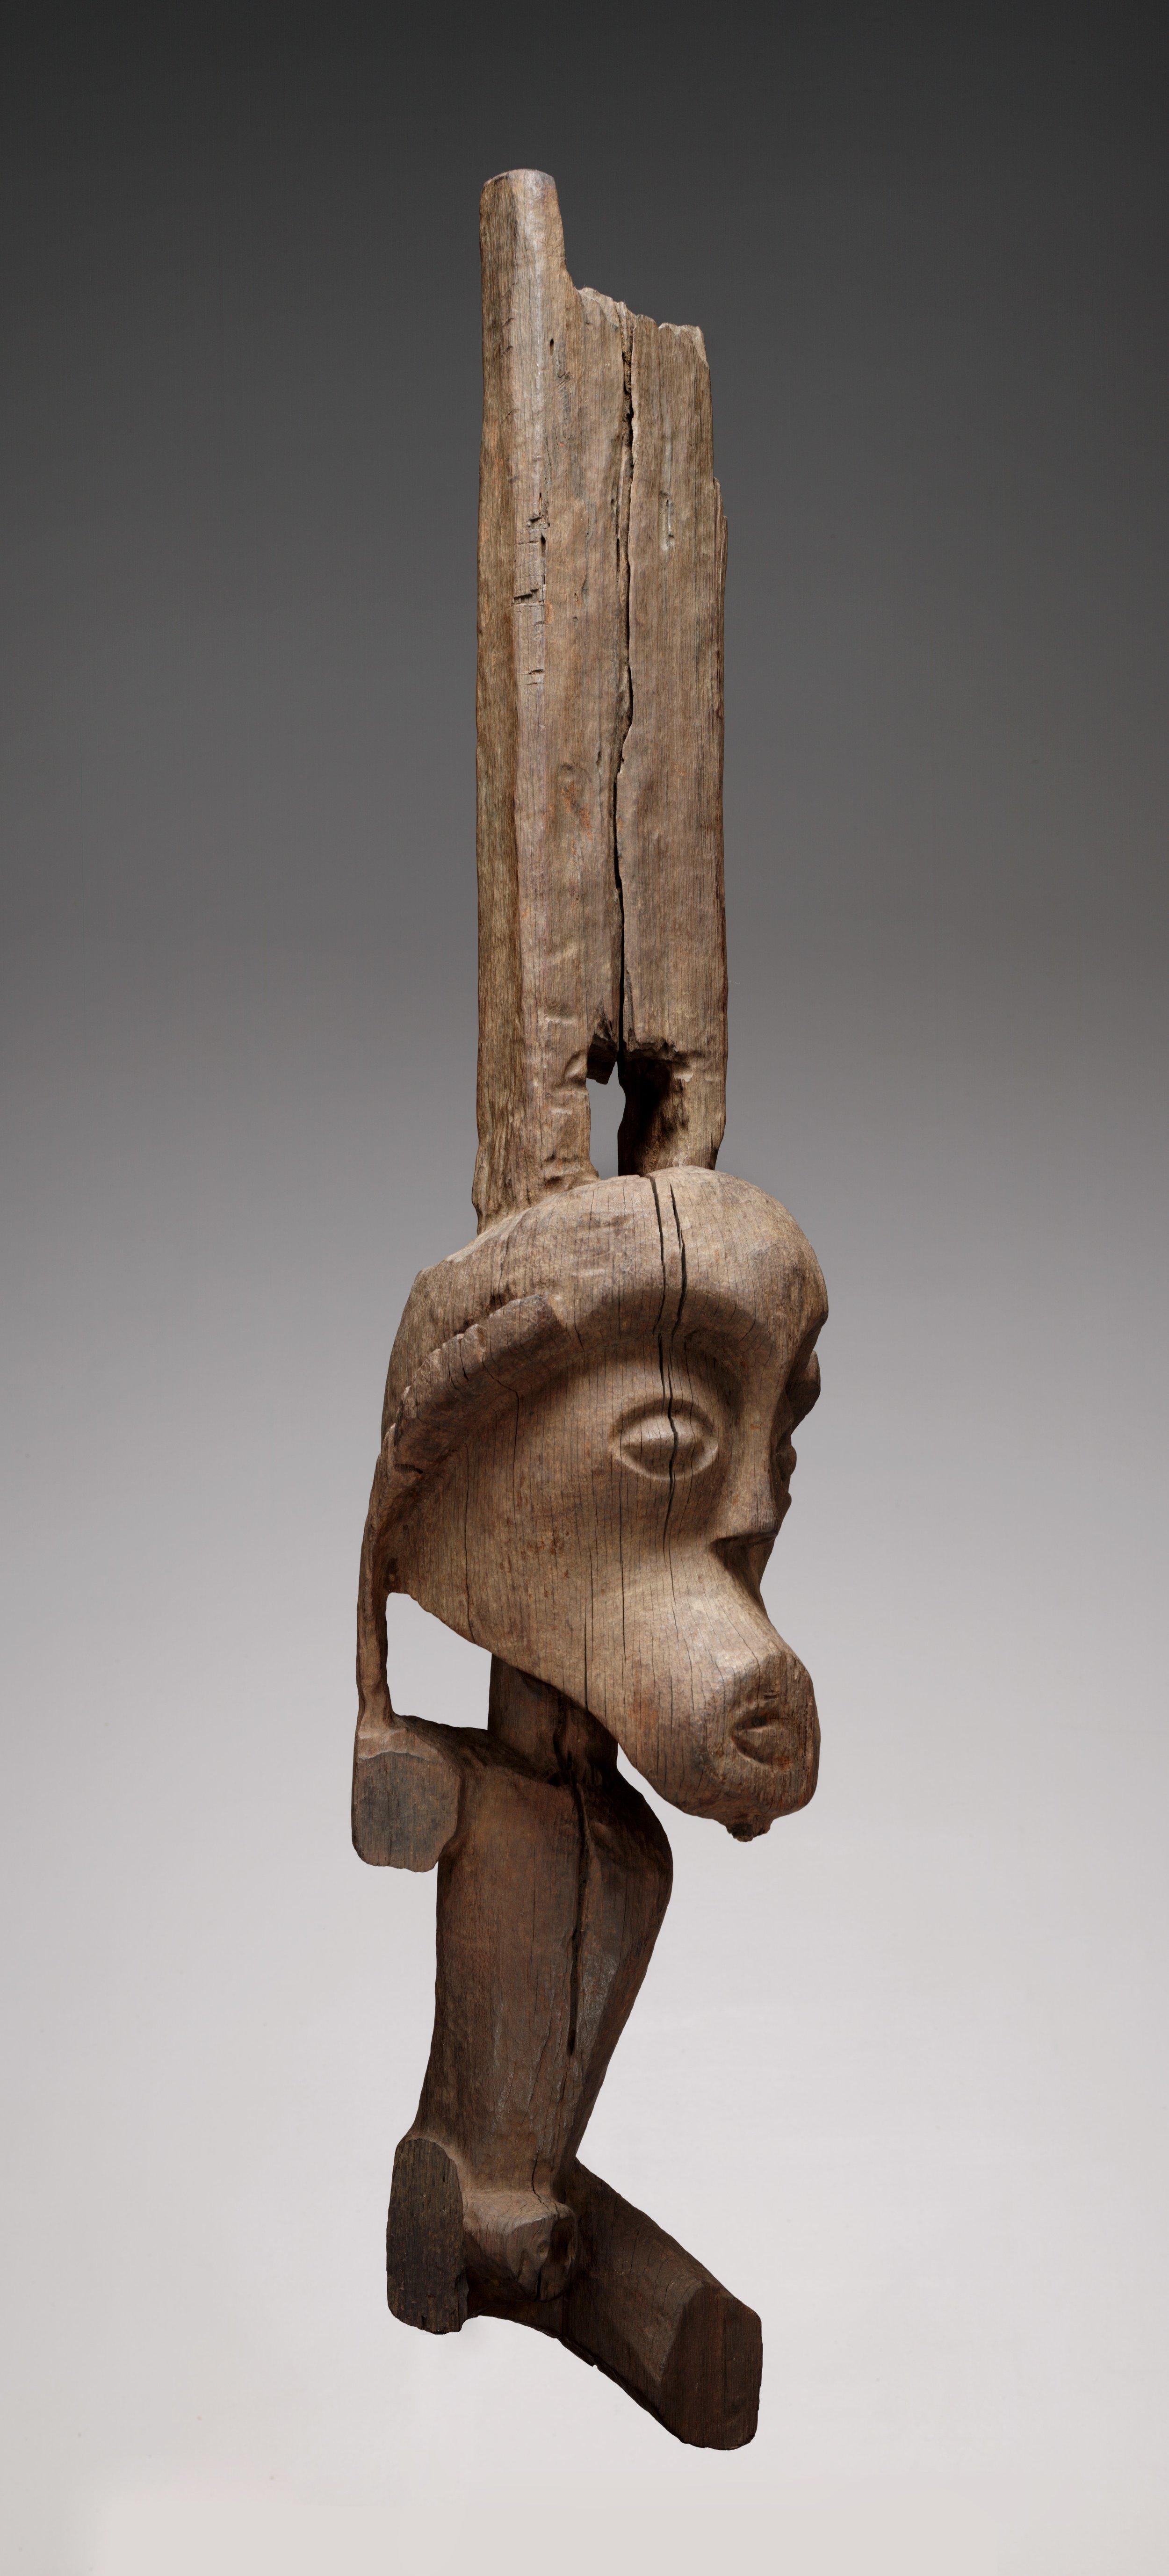 Tuletary Figure © The Dallas Museum of Art | Texas, USA